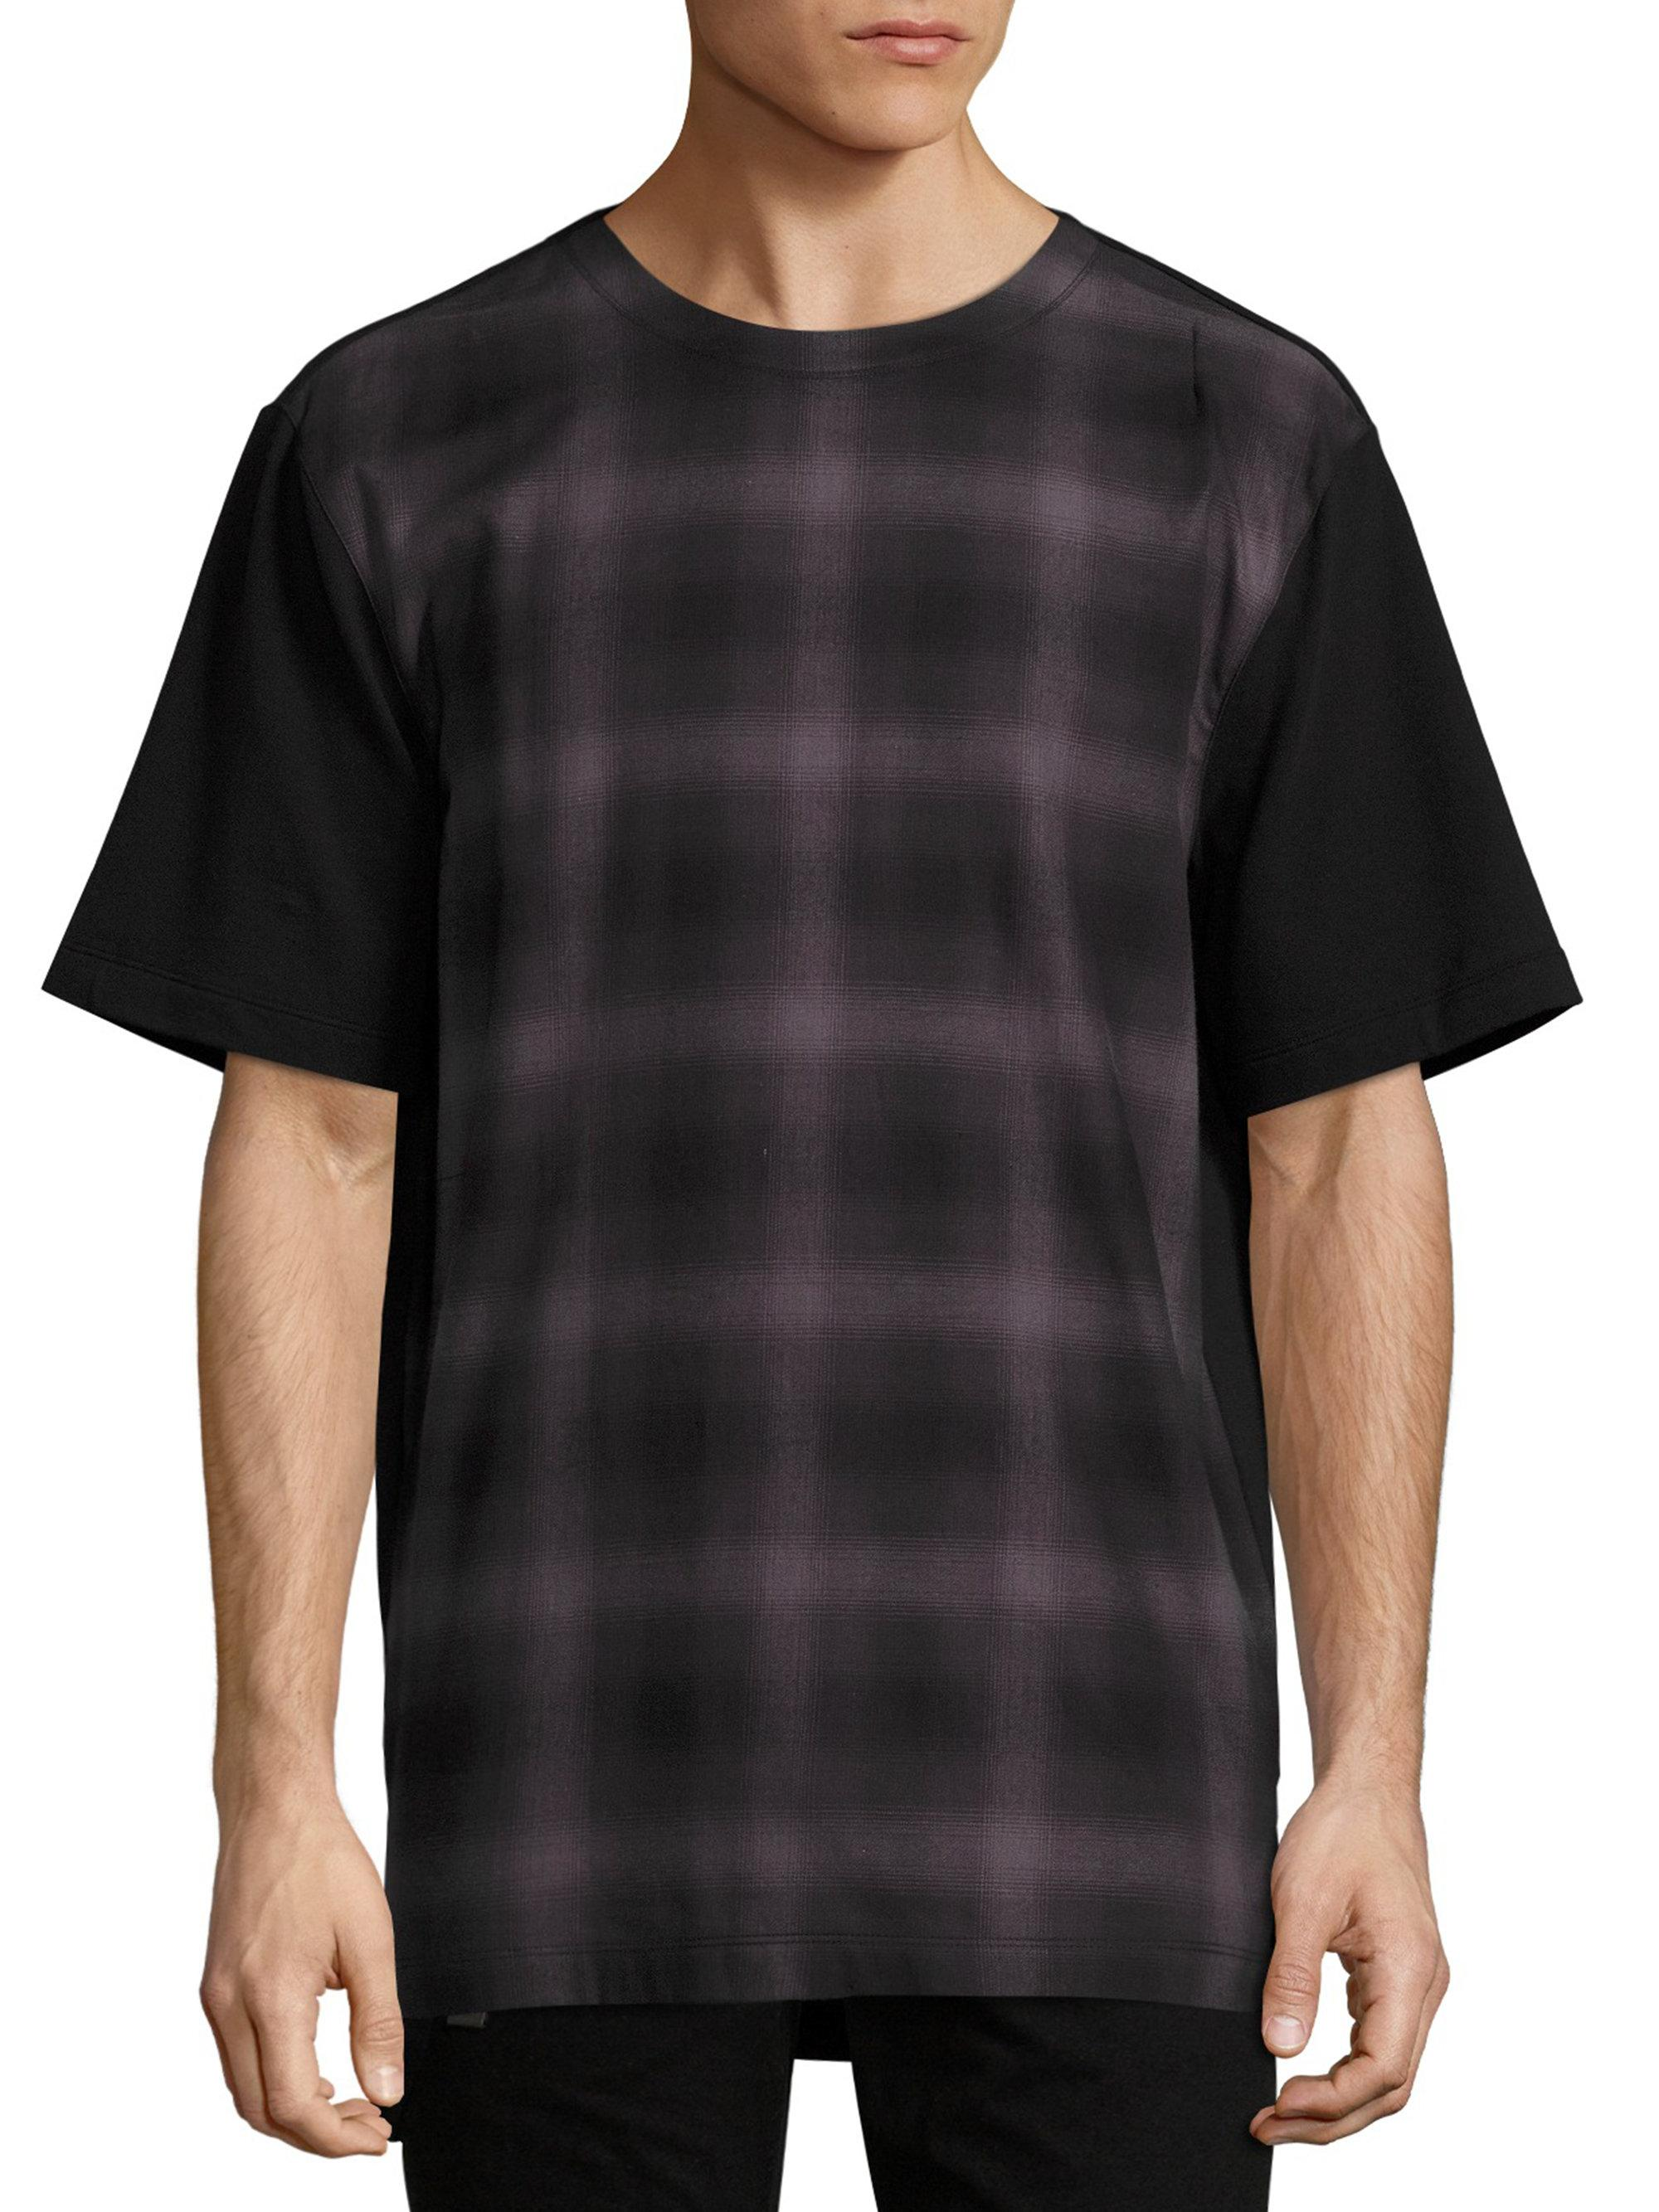 Helmut lang plaid front t shirt in black for men lyst for Helmut lang t shirt